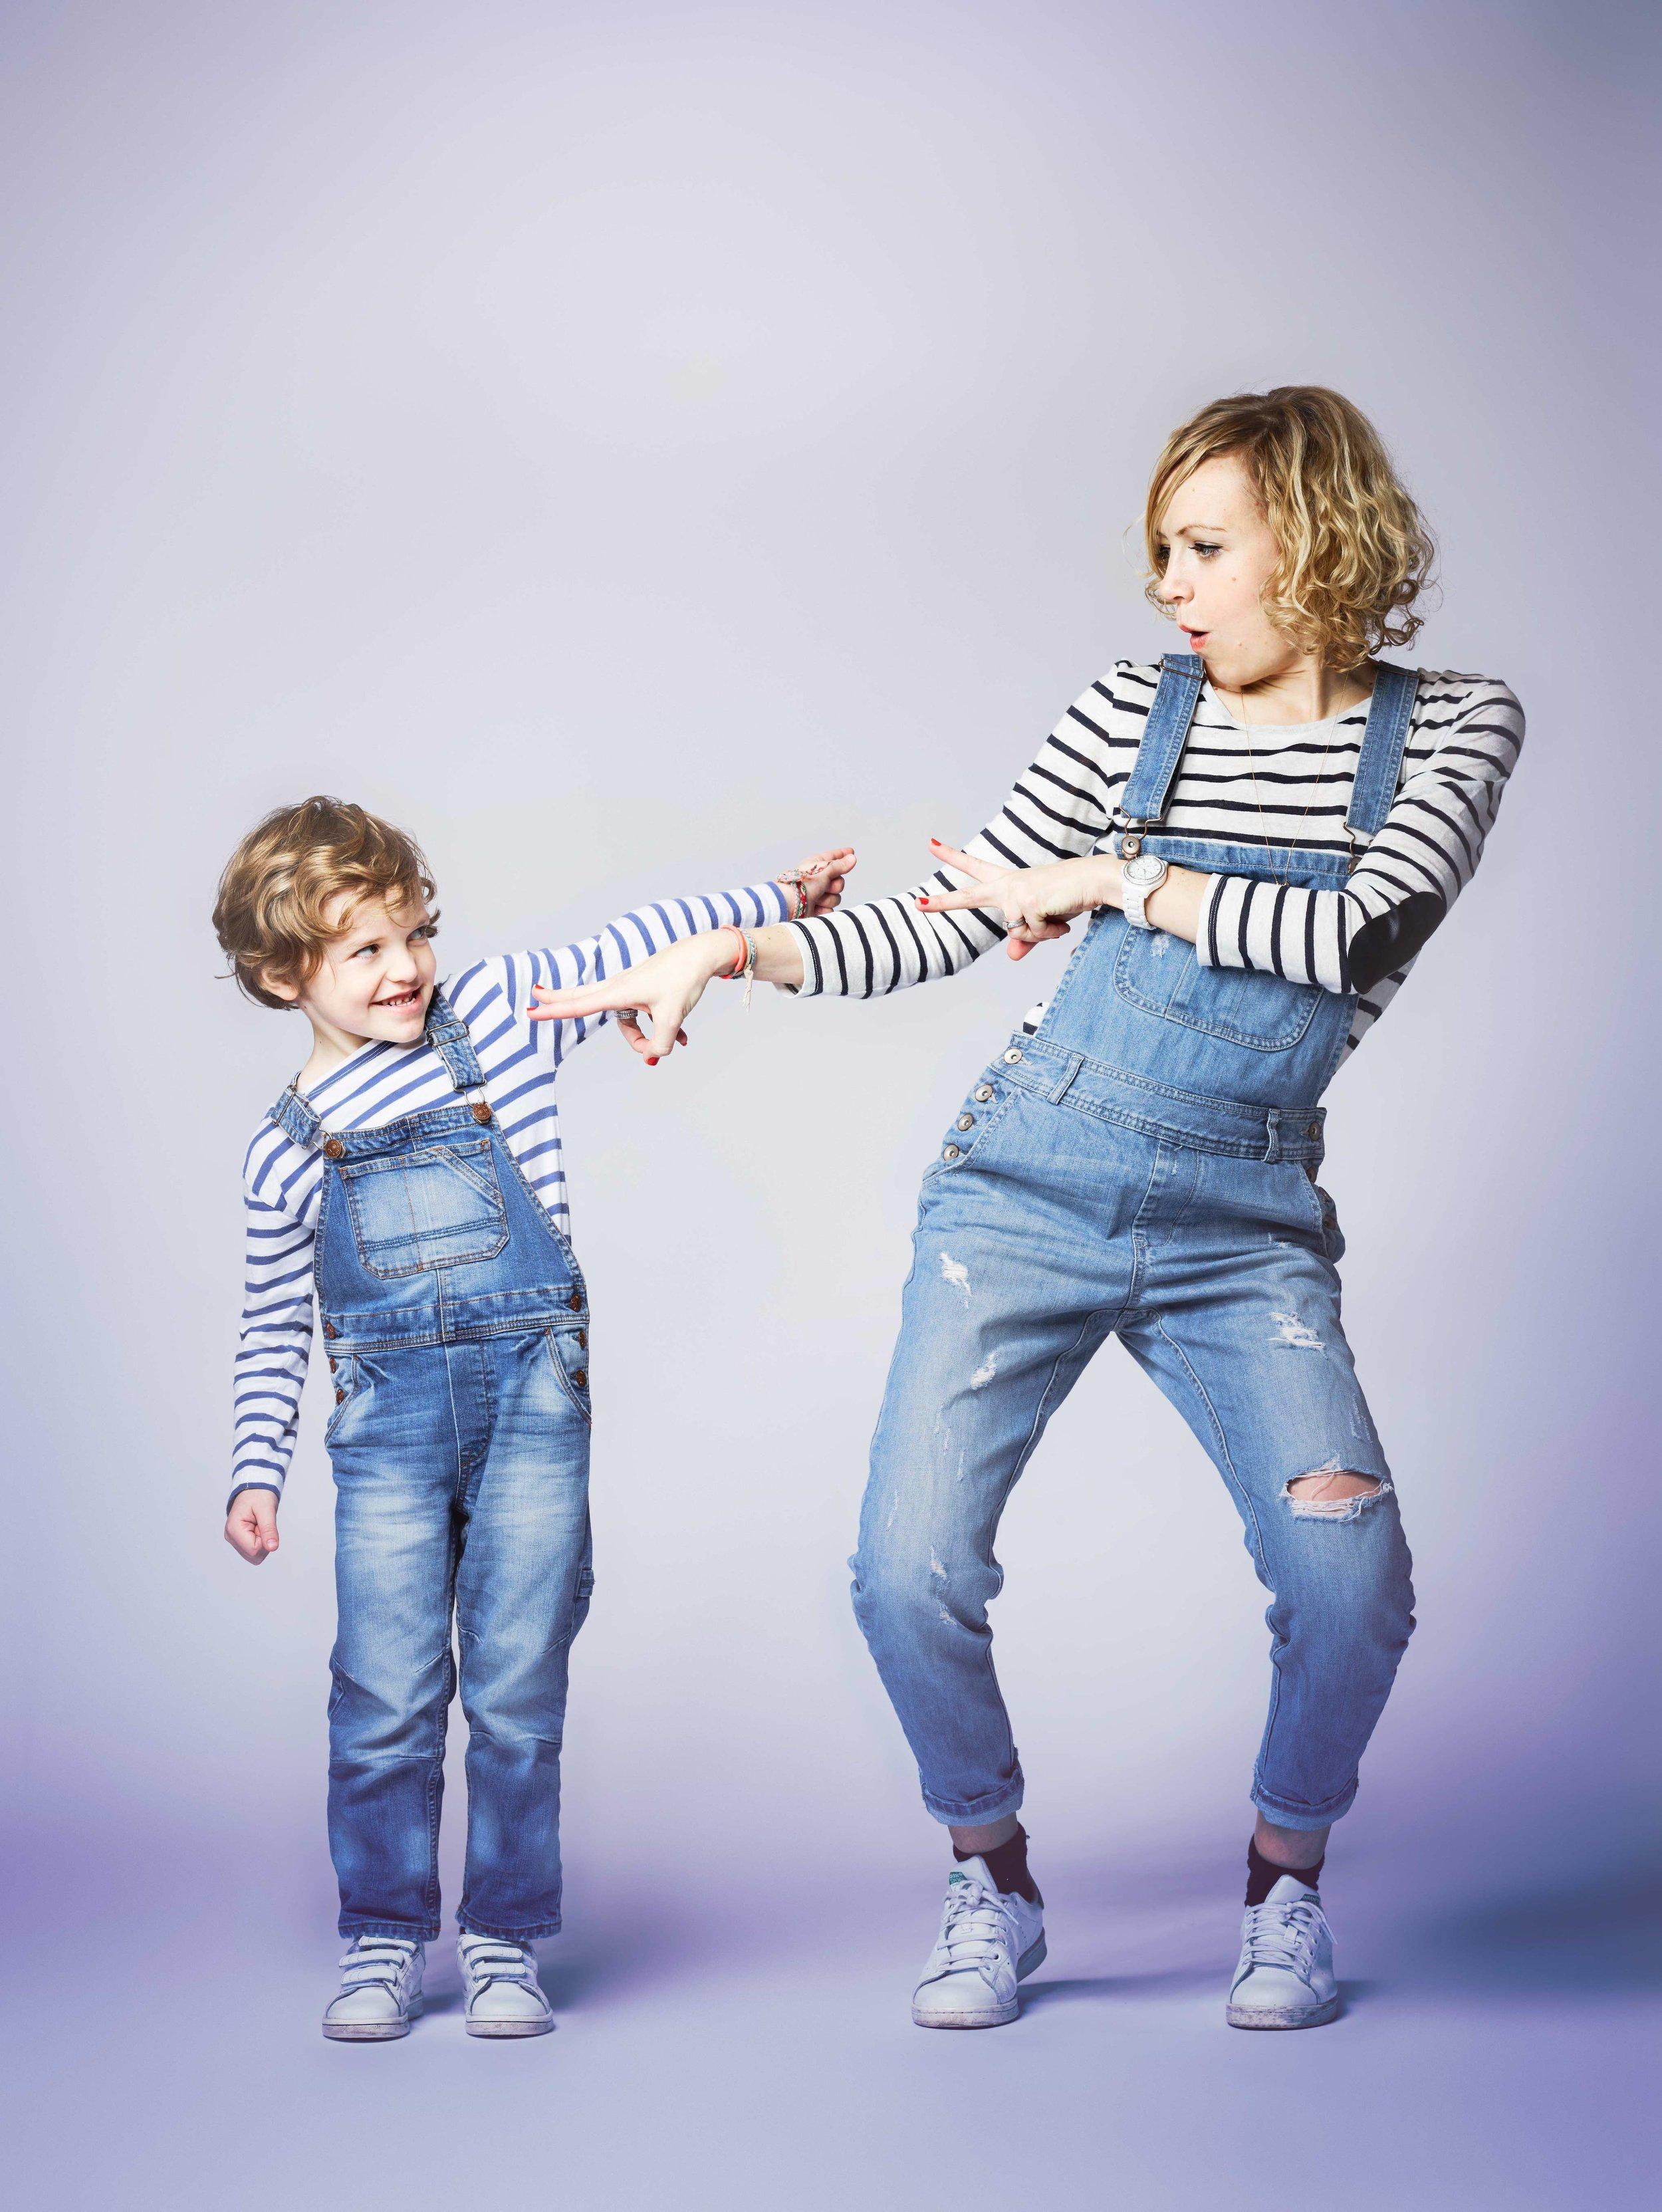 Mummy and Son -Edit.jpg